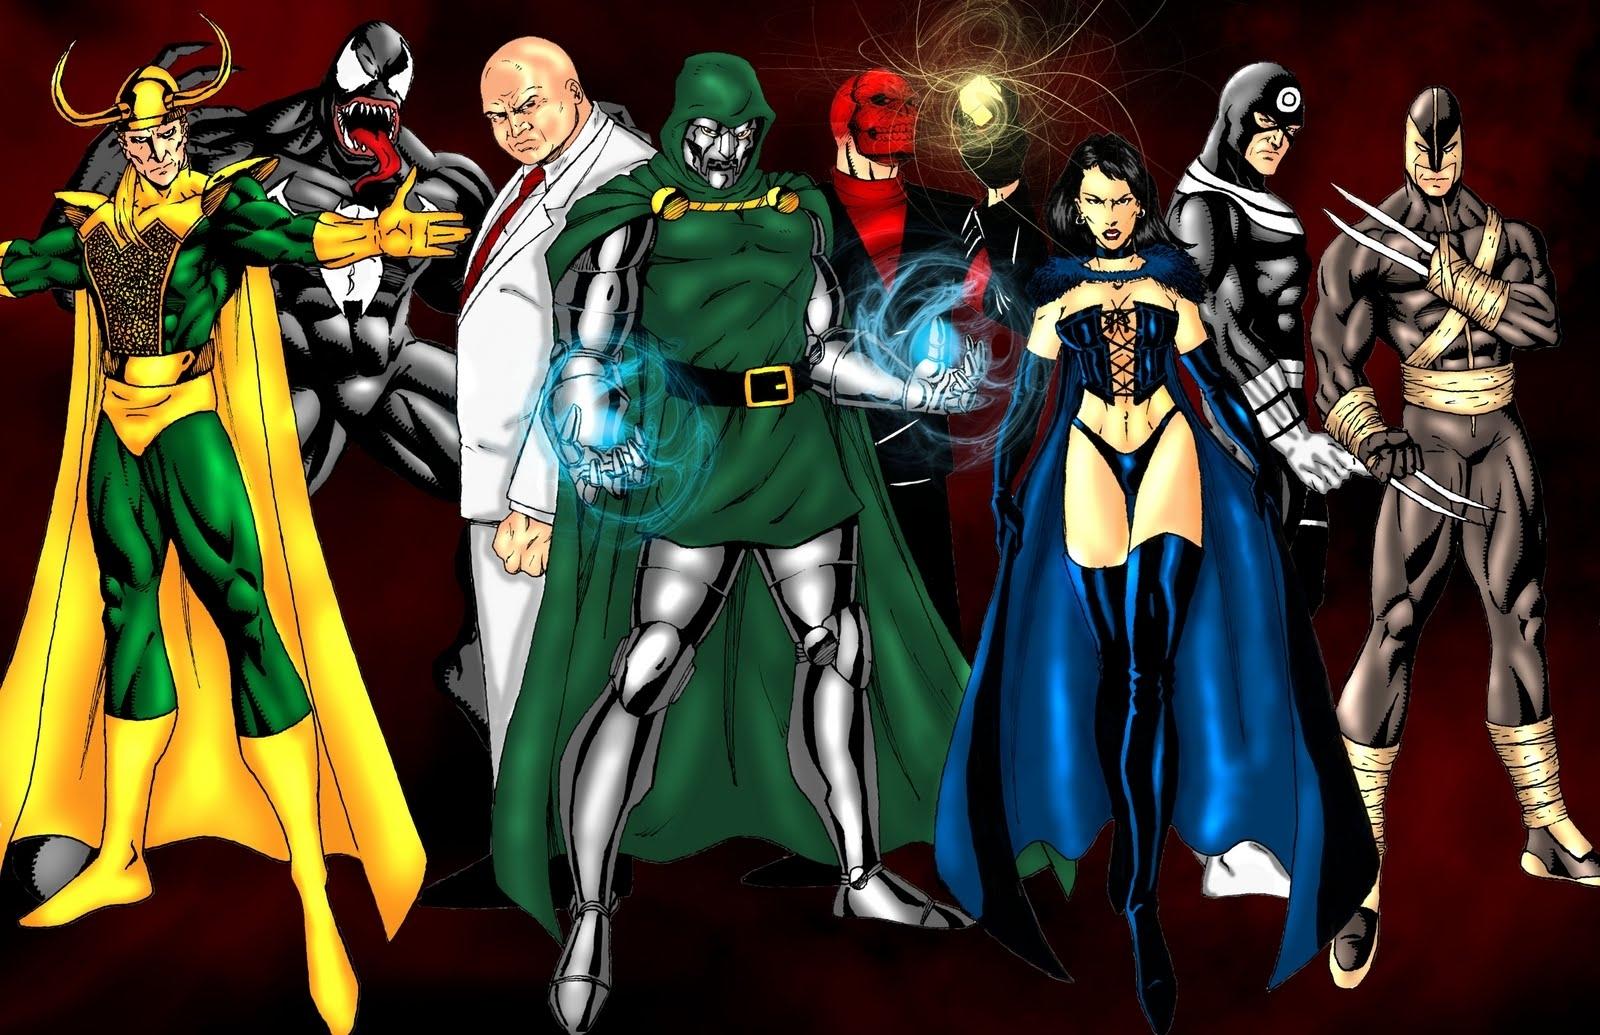 x-men characters villains | wilson art: marvel villains | comic book